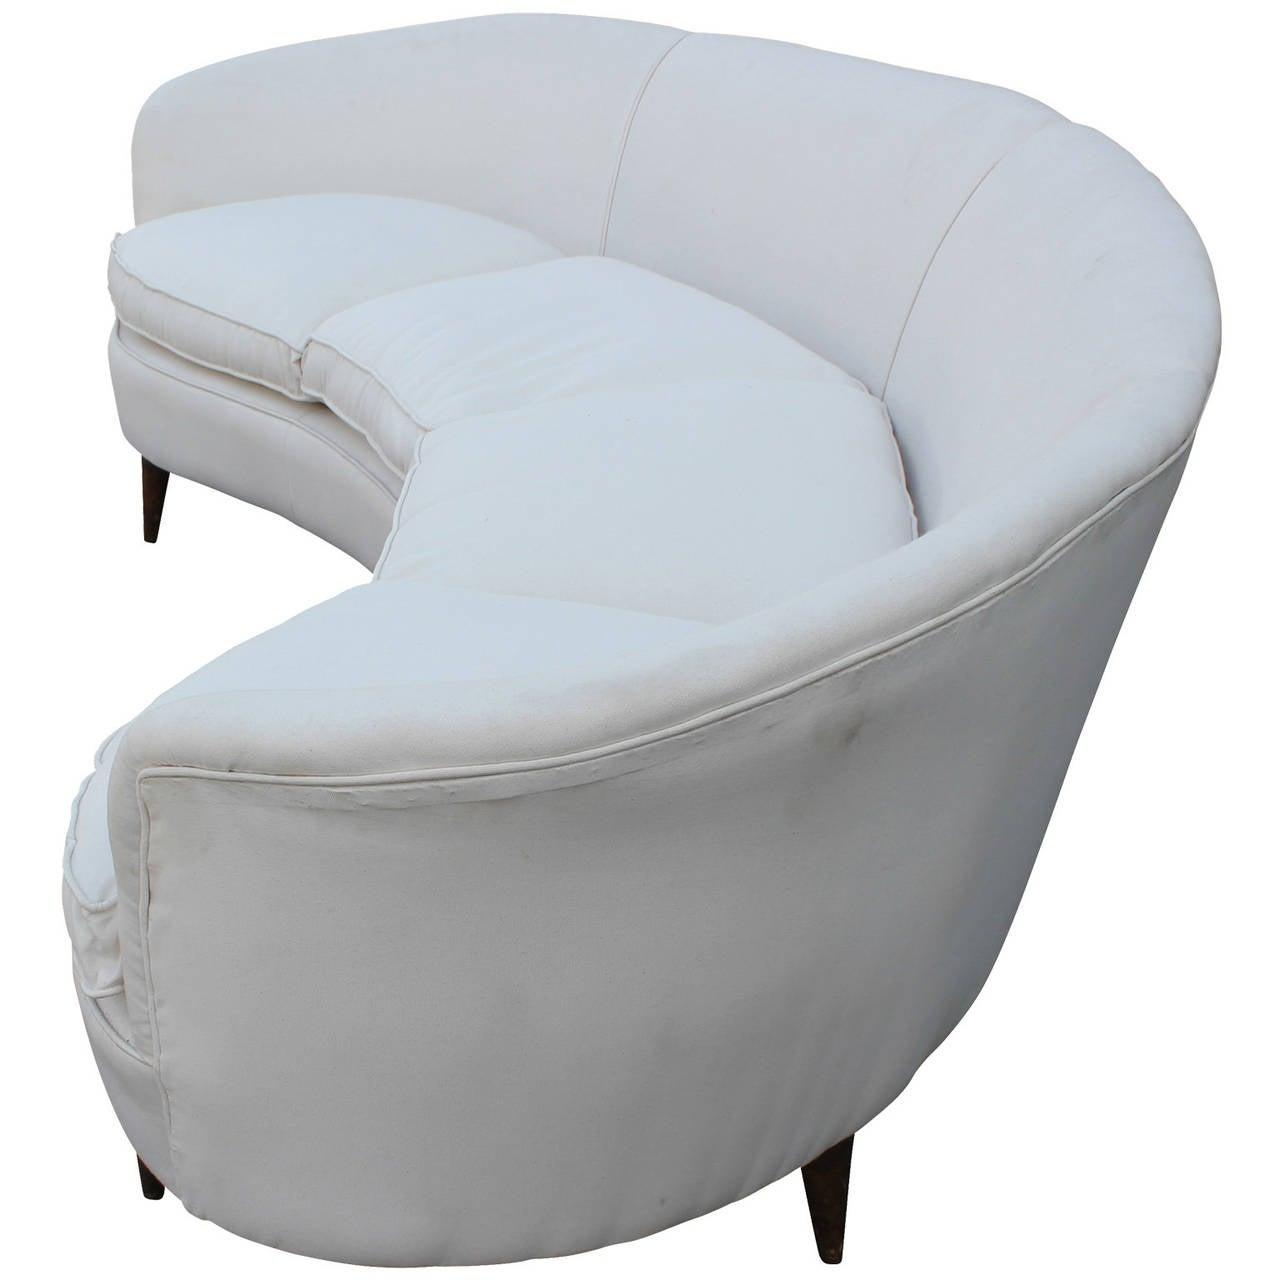 Mid-Century Modern Curved White Italian Sofa